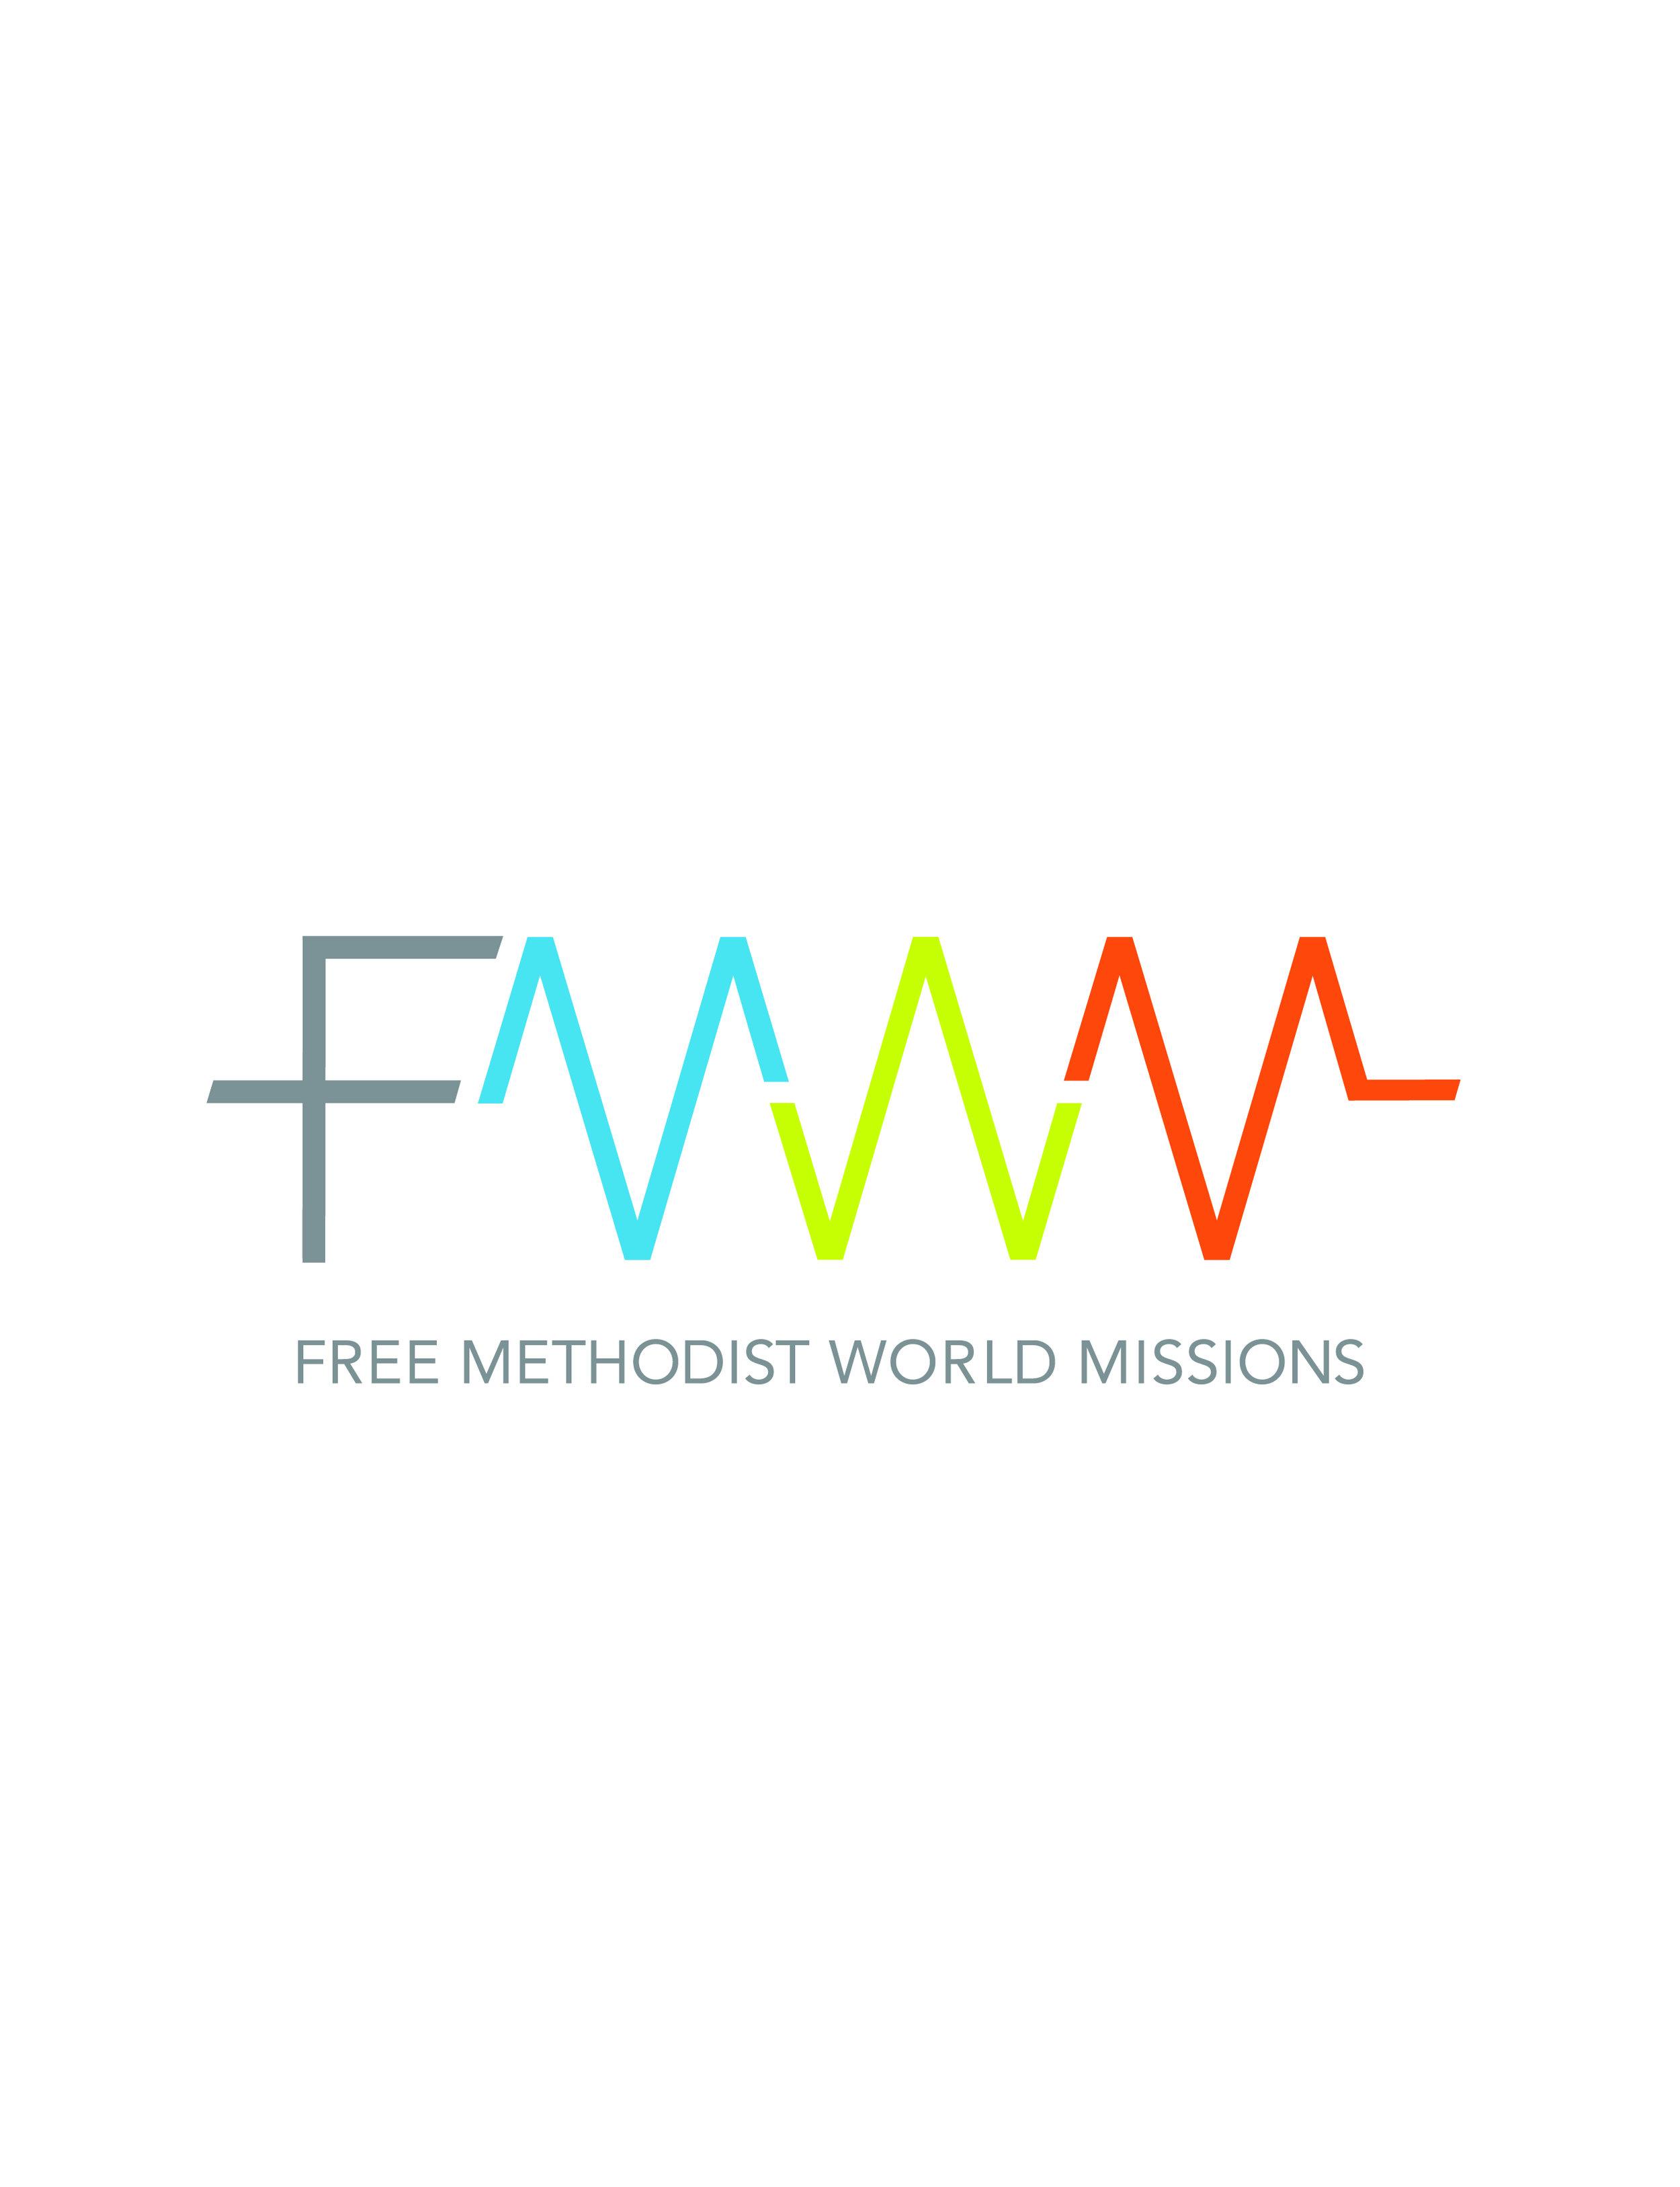 FMWM-TypeOnly-CMYK.jpg